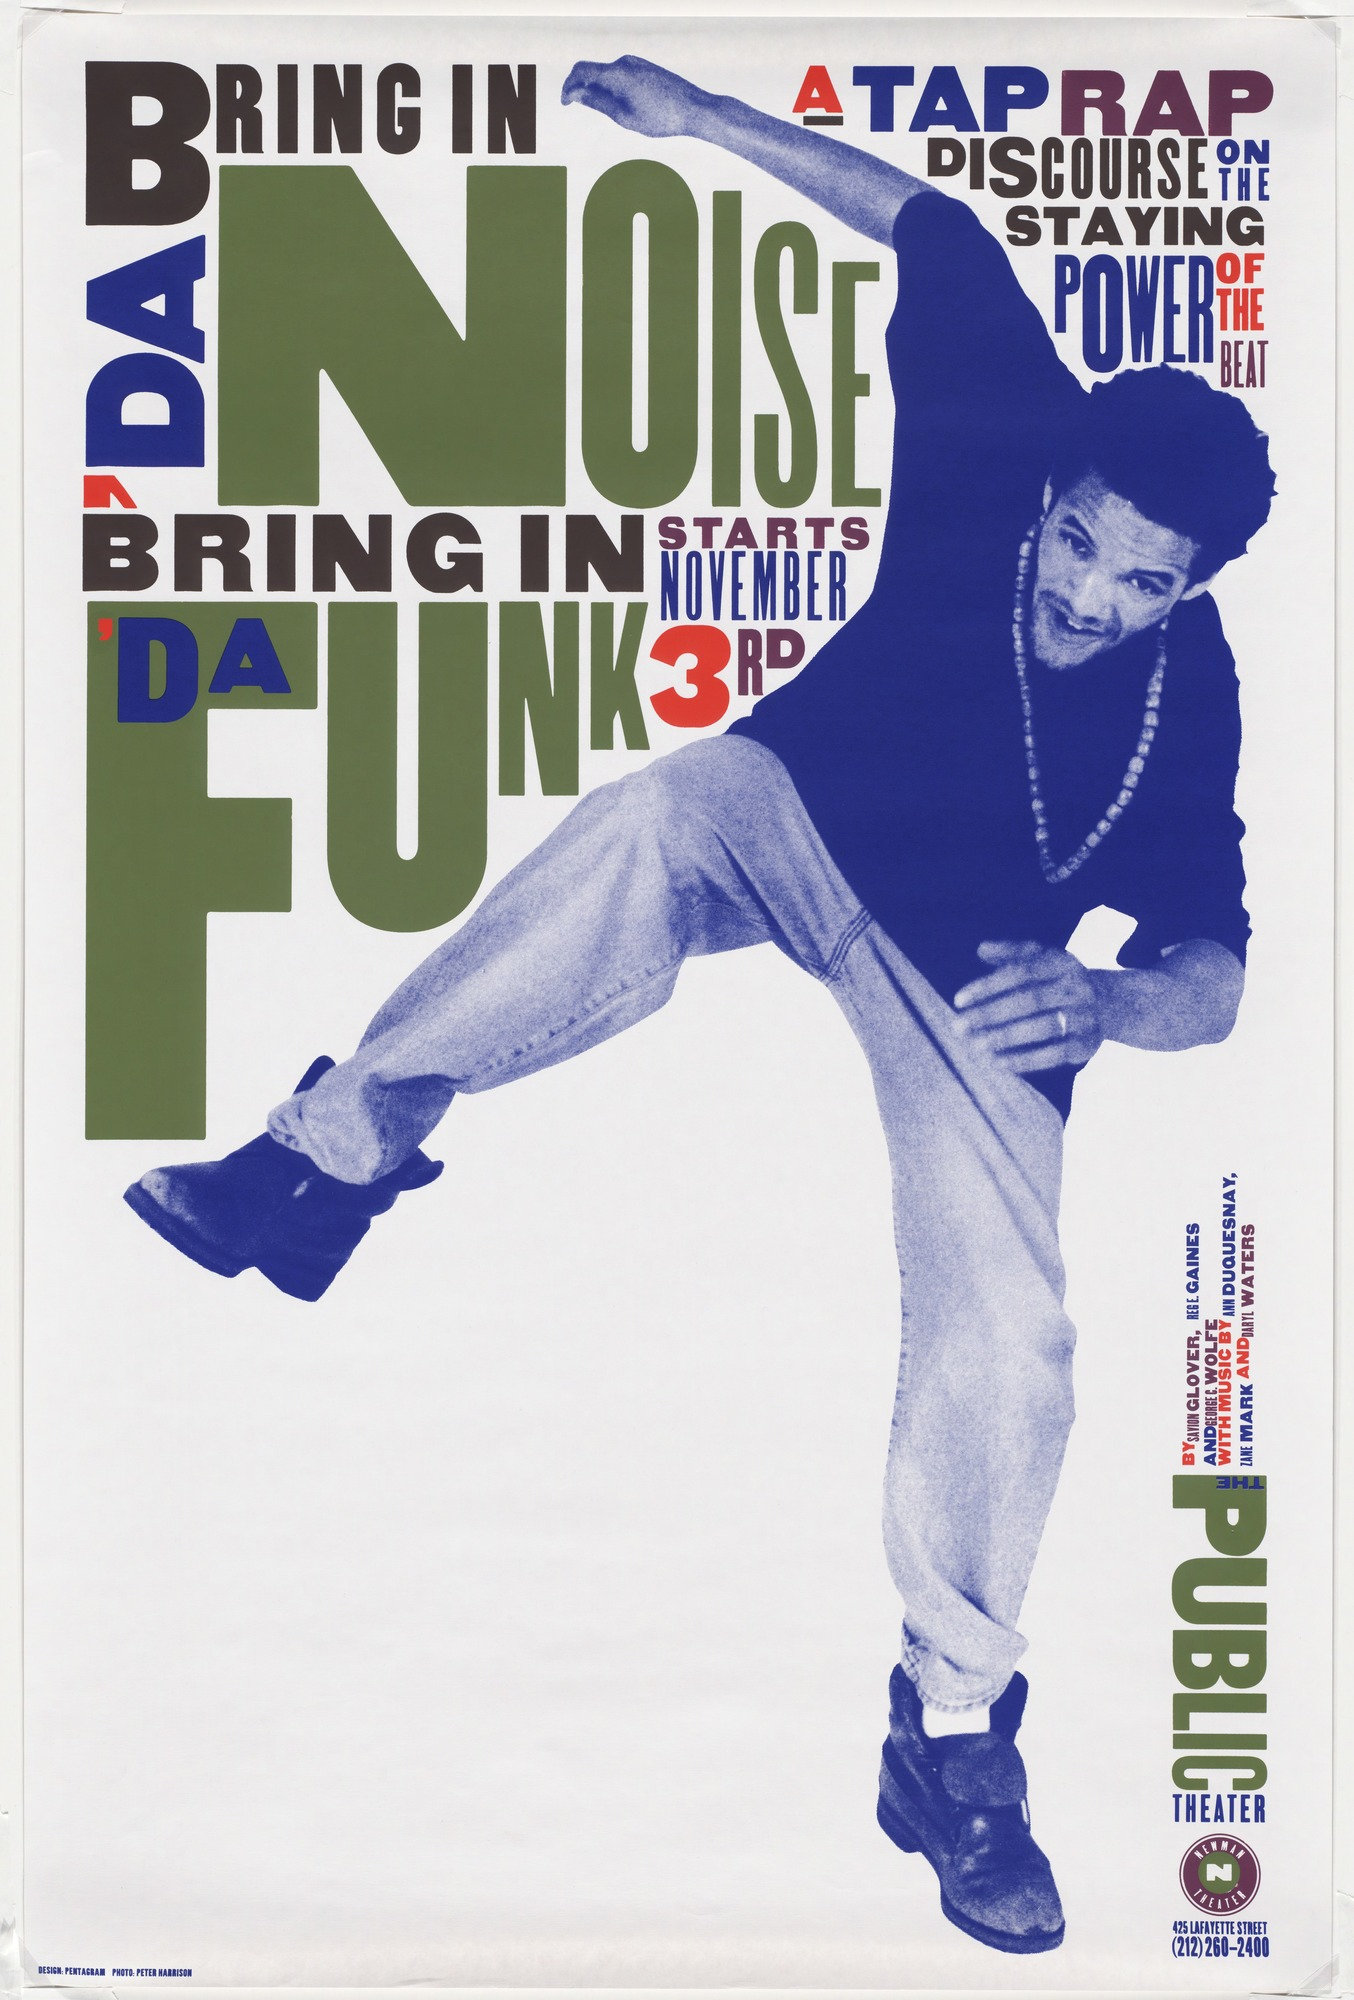 Bringin' The Noise Bringin' the Funk.jpg